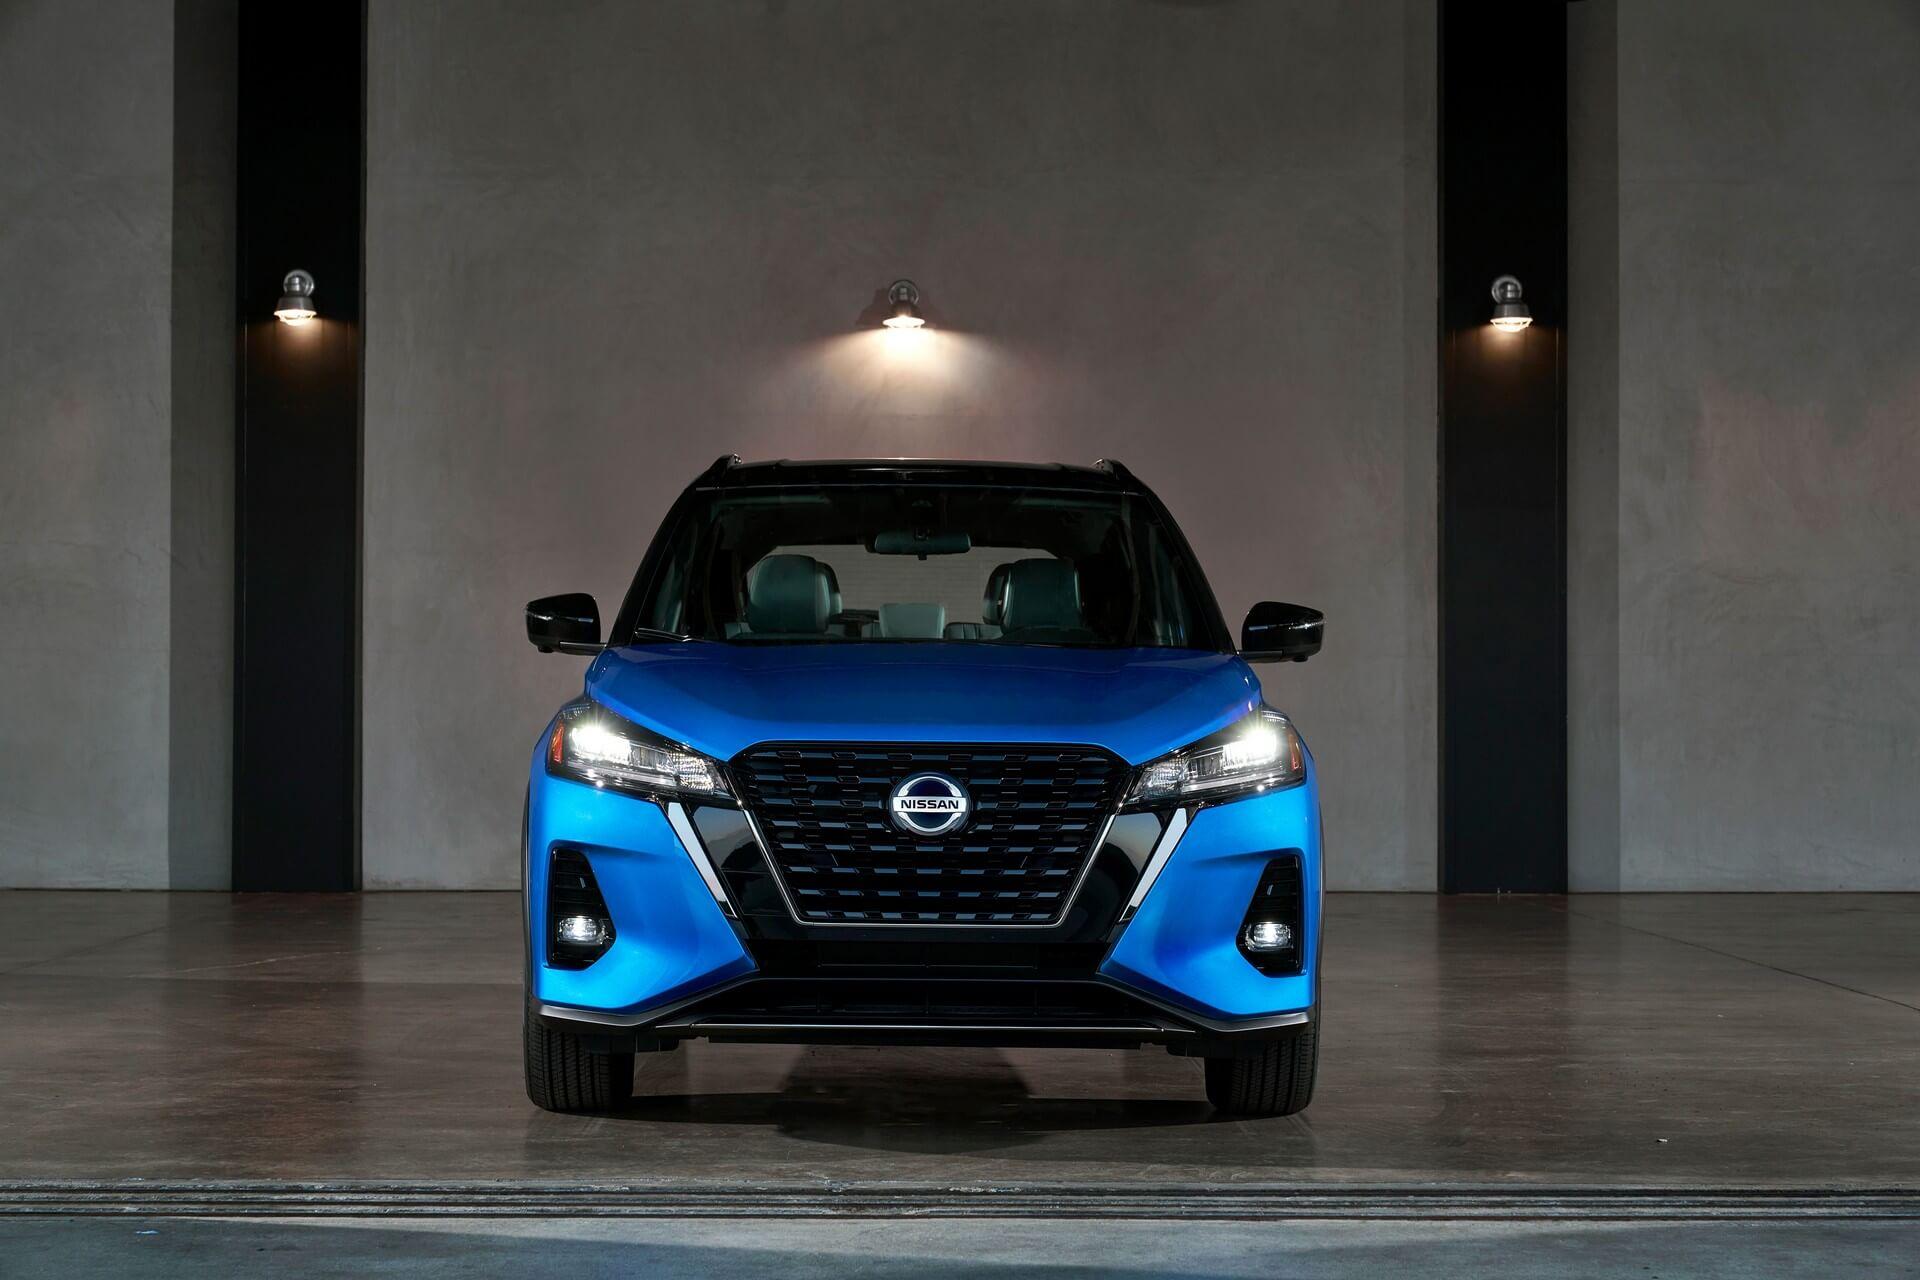 2021 Yeni Nissan Kicks